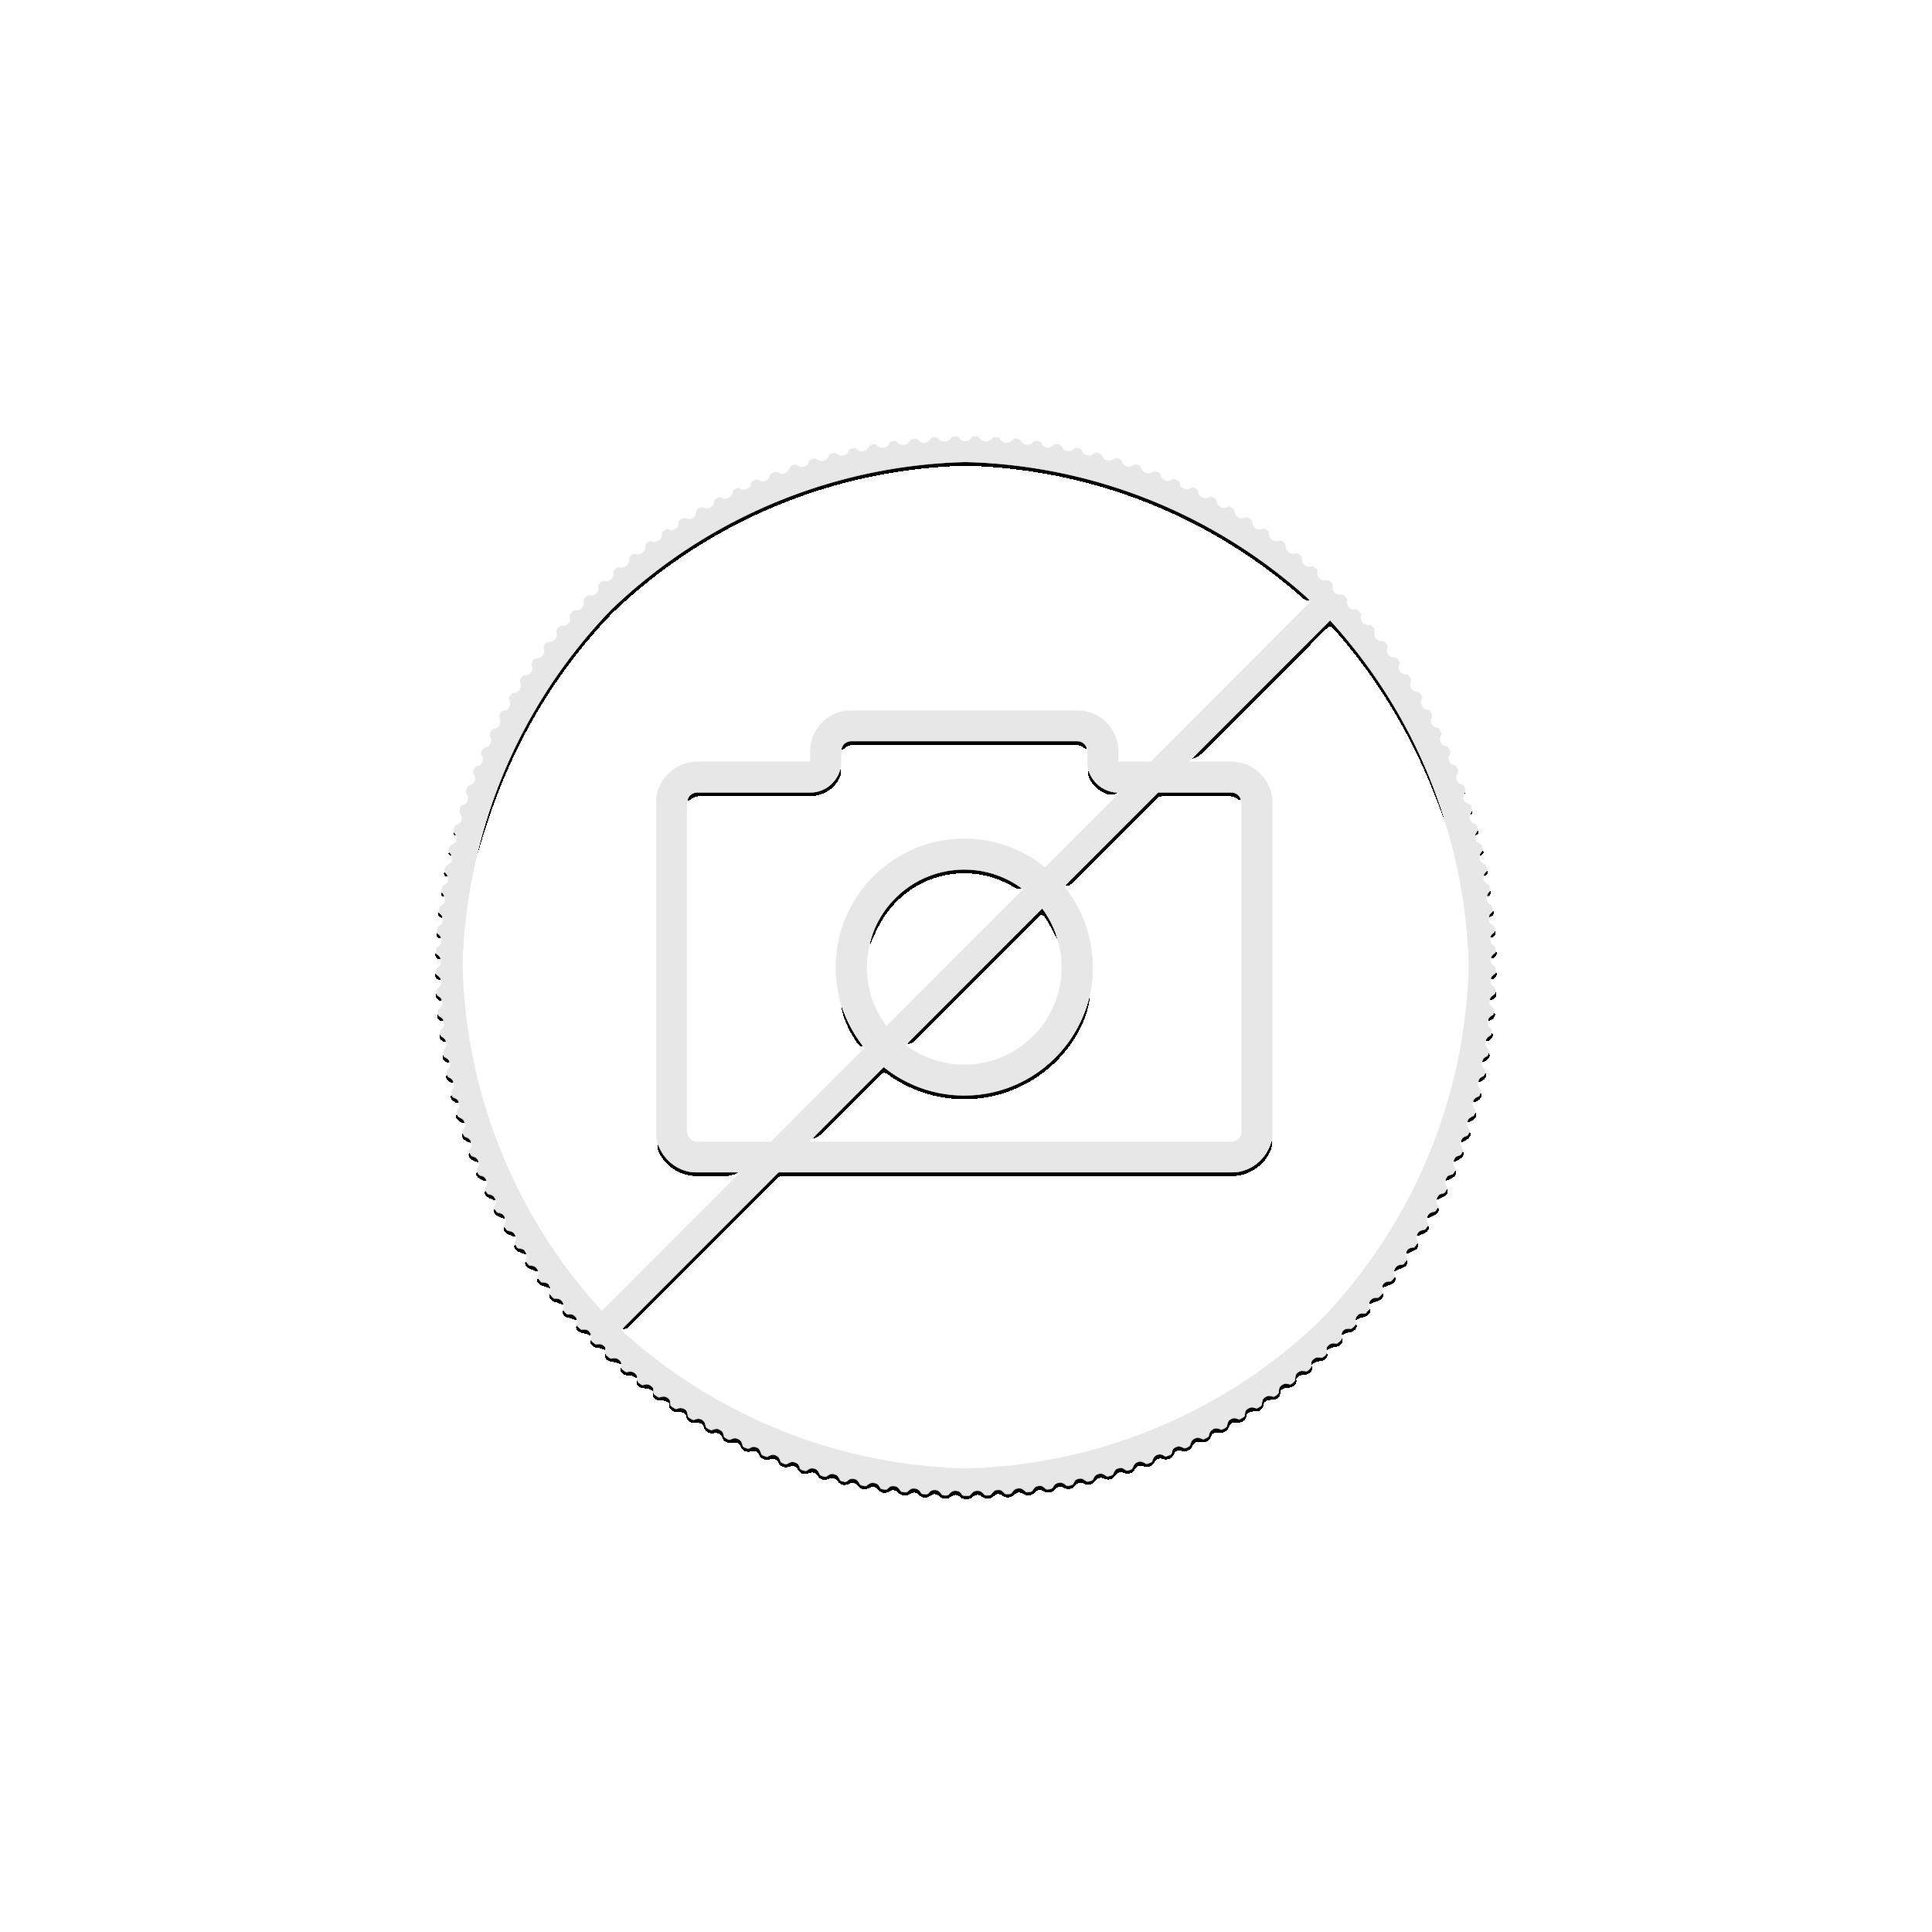 1 Kilogram silver coin Lunar 2019